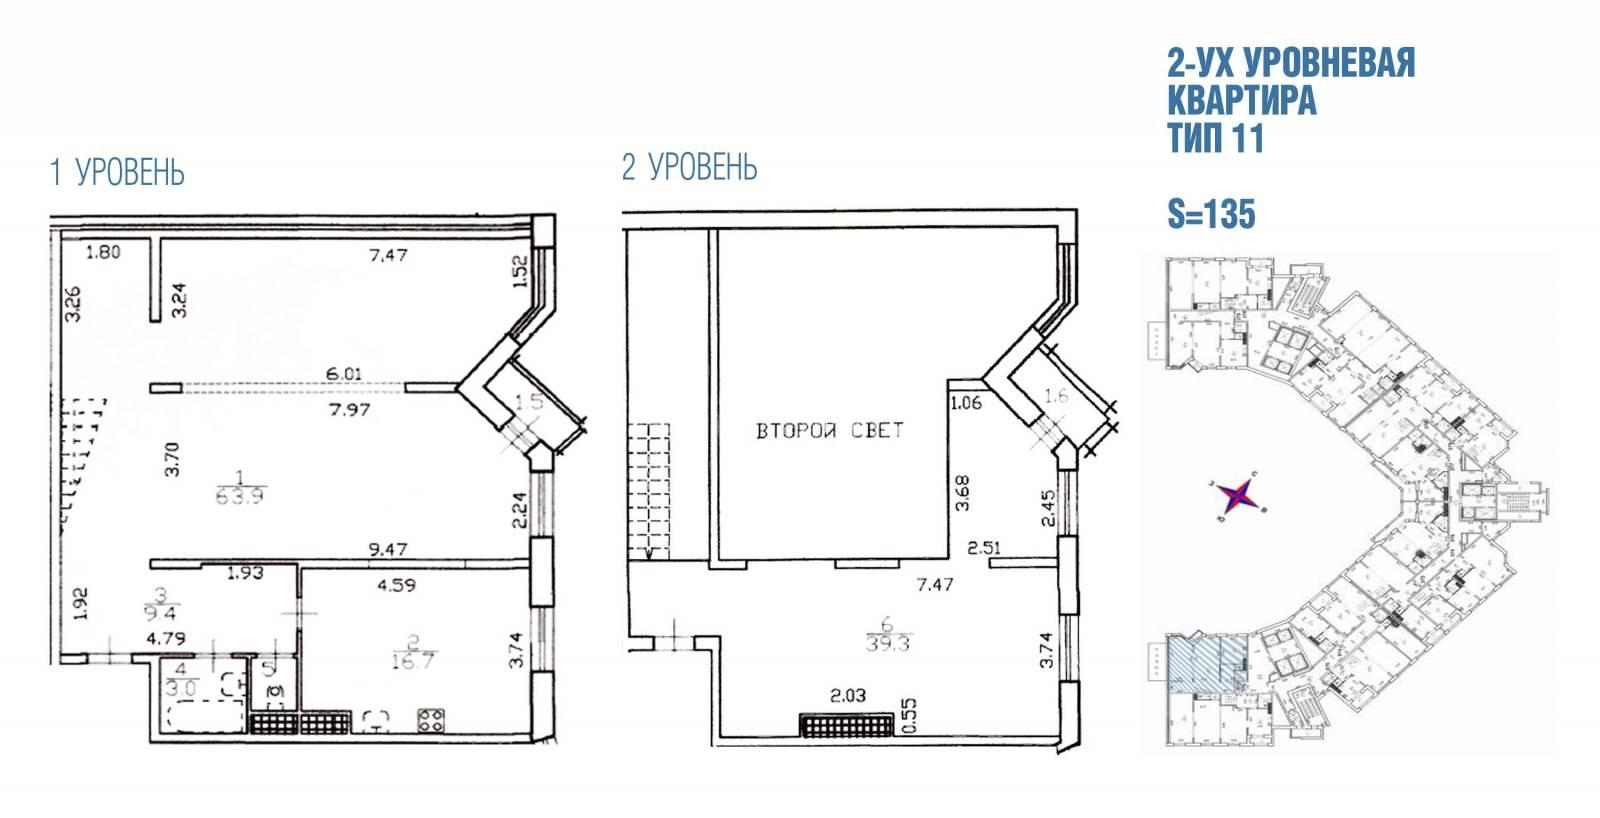 Двухуровневая квартира тип 11 S=135